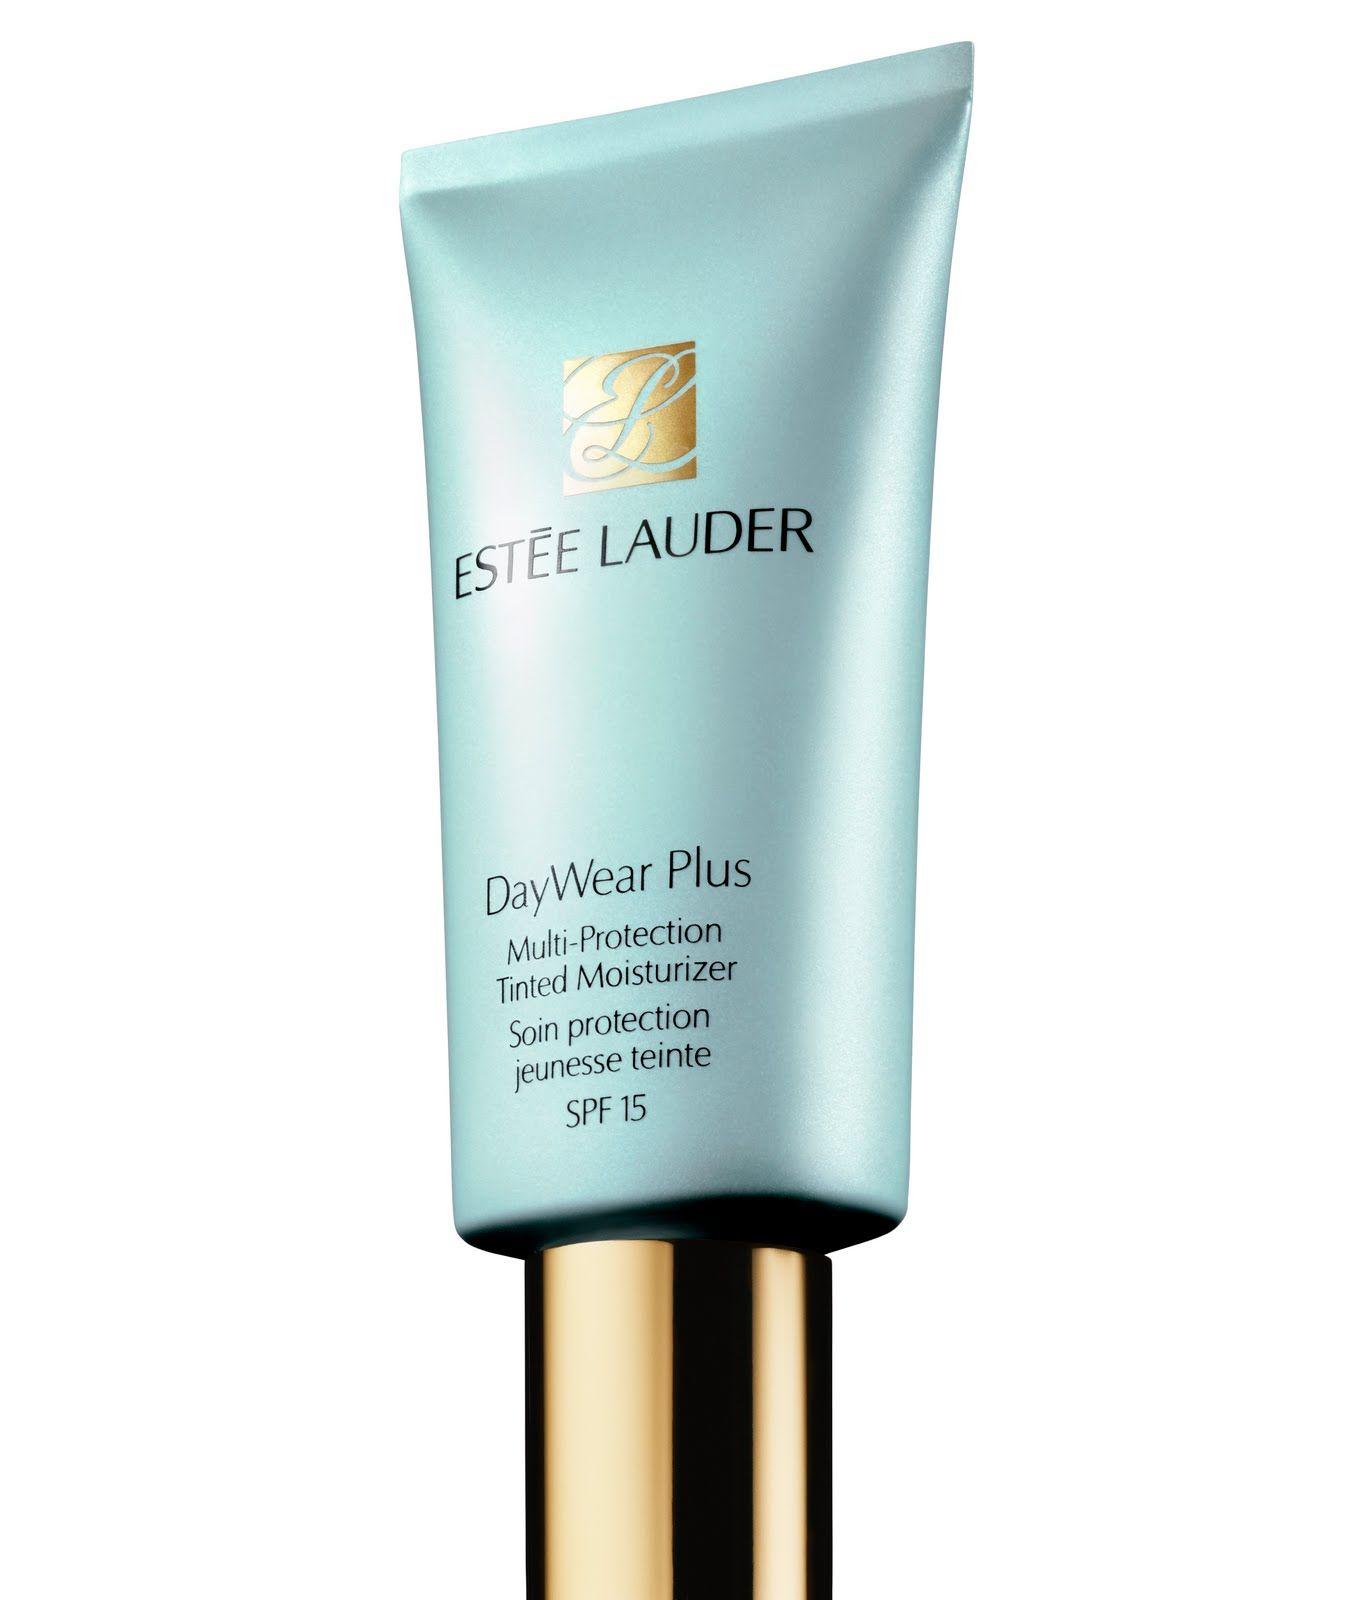 Estee Lauder Daywear Plus Multi Protection Tinted Moisturizer Spf 15 In Light Medium 02 Now Reformulated Tinted Moisturizer Estee Lauder Estee